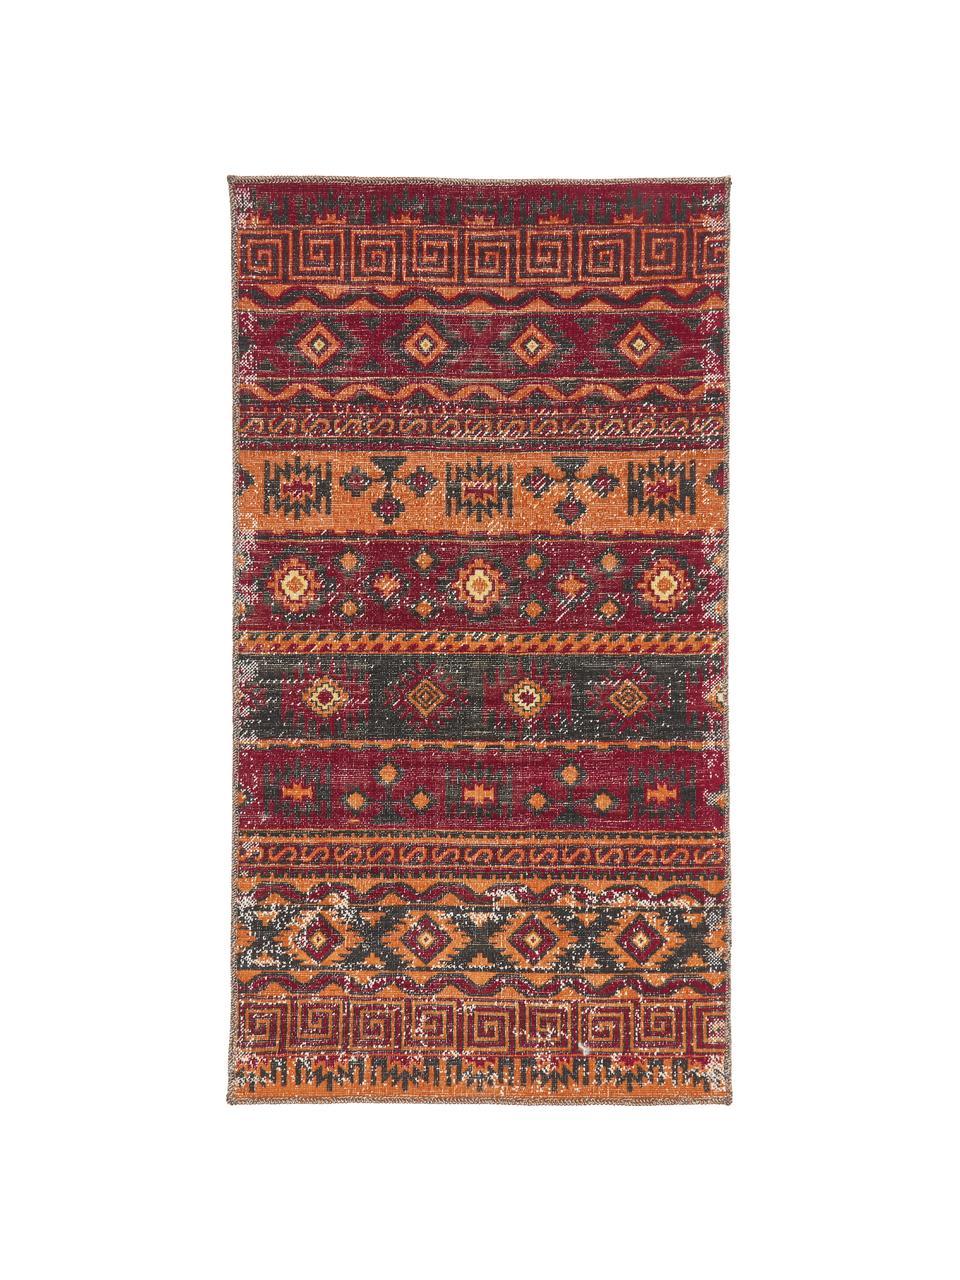 In- & Outdoor-Teppich Tilas Istanbul in Dunkelrot, Orient Style, Dunkelrot, Senfgelb, Khaki, B 200 x L 290 cm (Größe L)